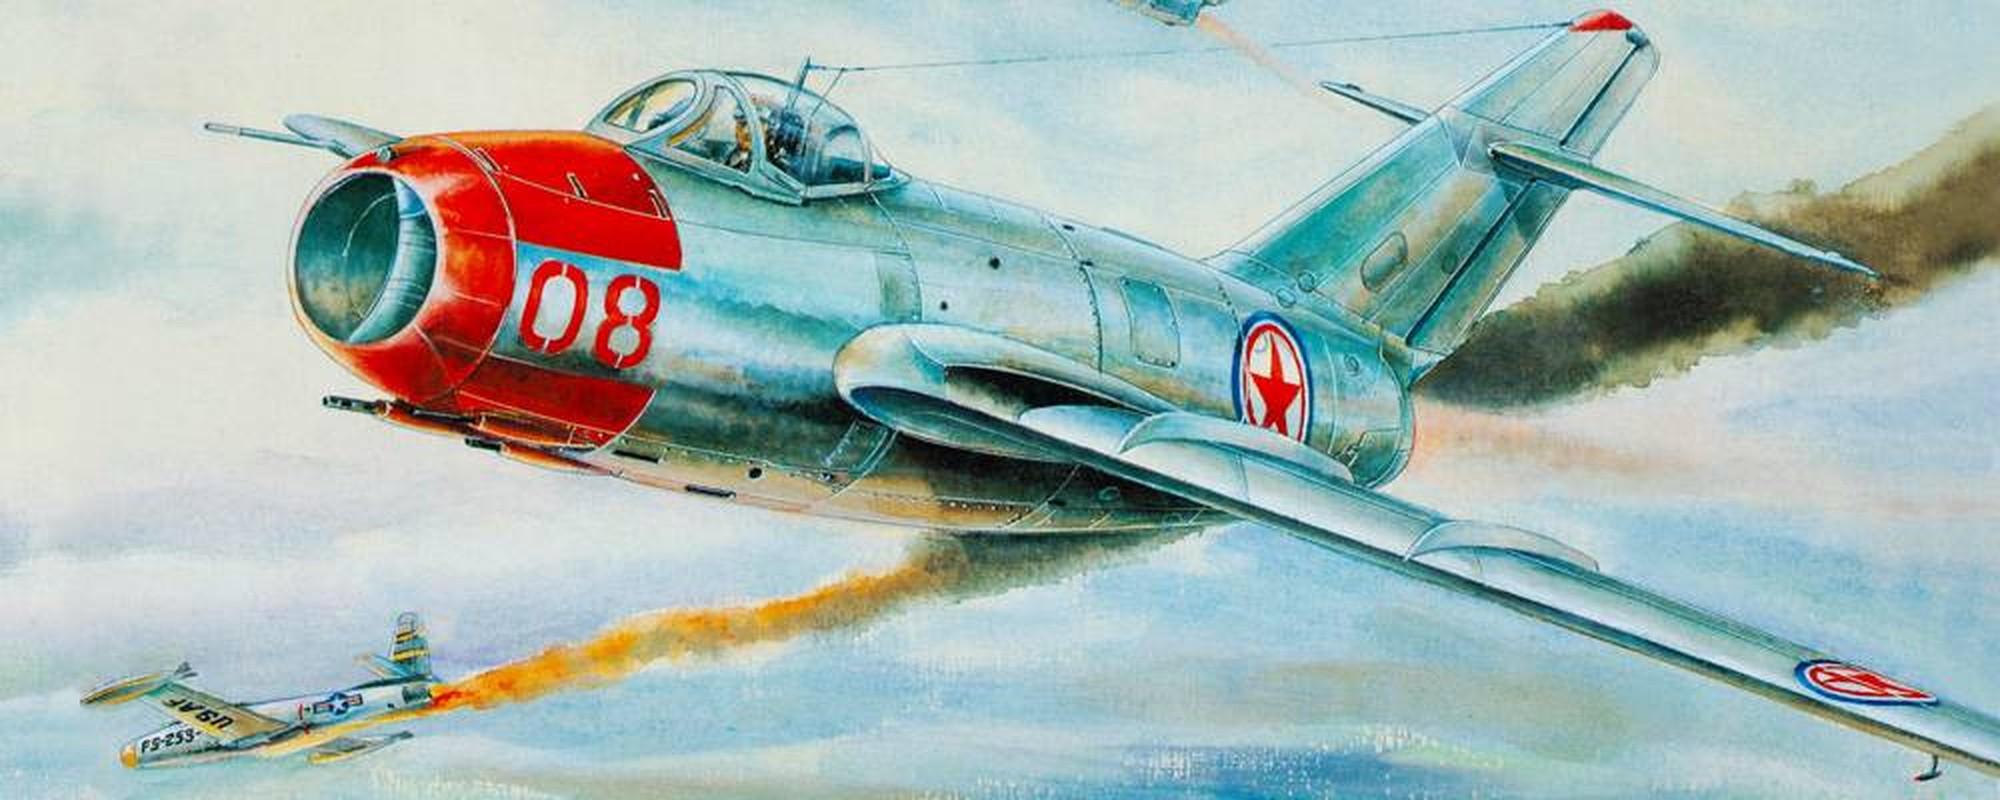 Lien Xo san sang doi 7 tiem kich MiG-15 cho chiec tiem kich My nay-Hinh-10